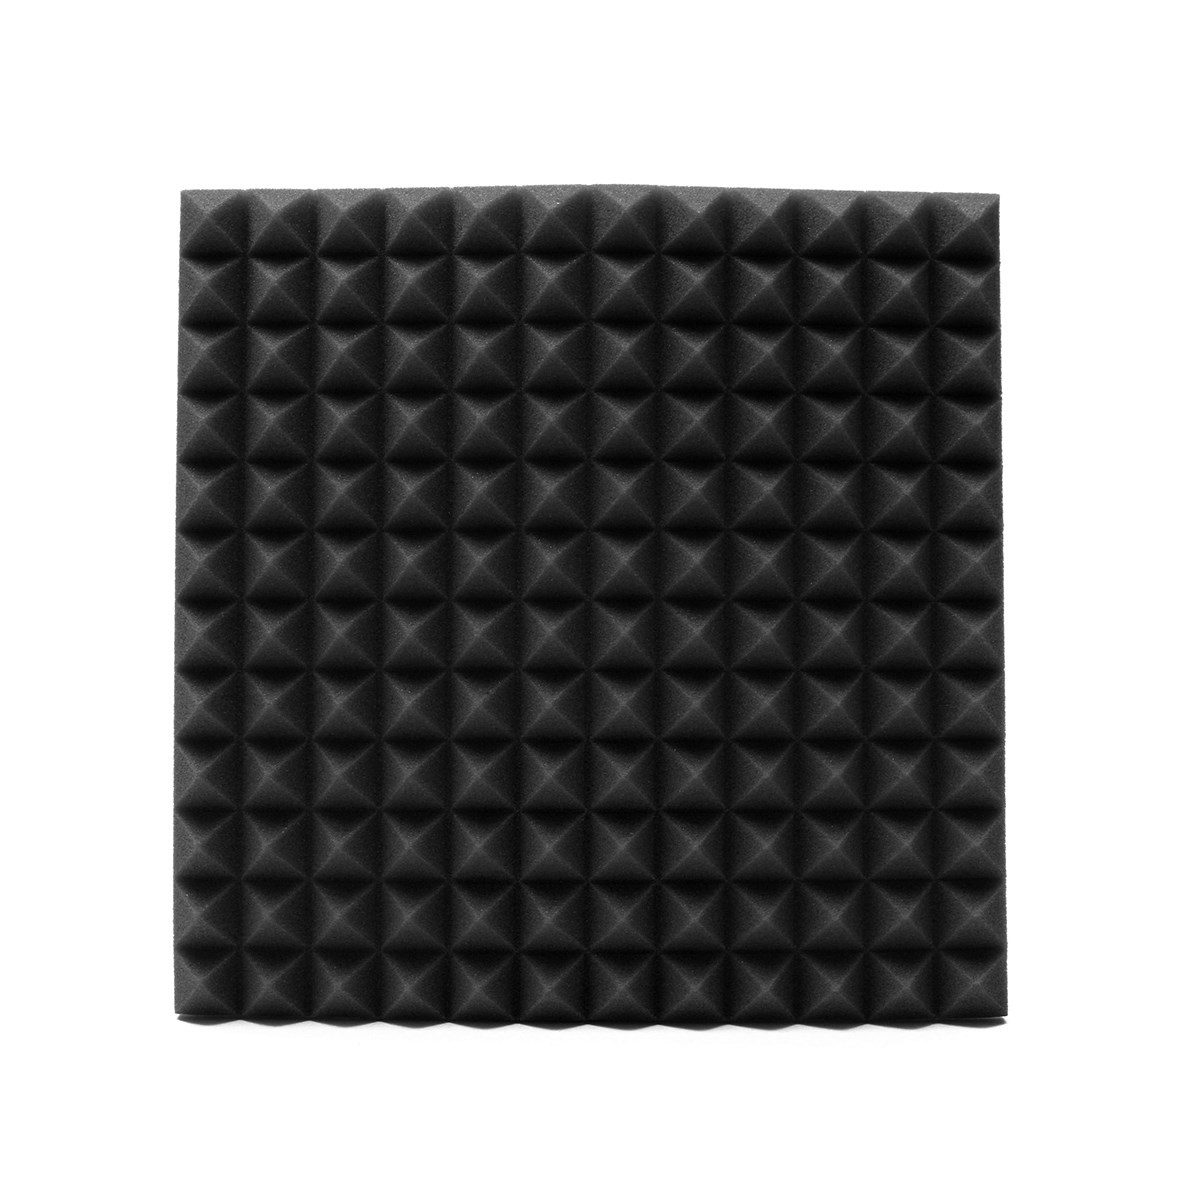 45x45x3cm Black Soundproofing Foam Acoustic Foam Sound Treatment Absorption Wedge Tiles Pack Studio/Music